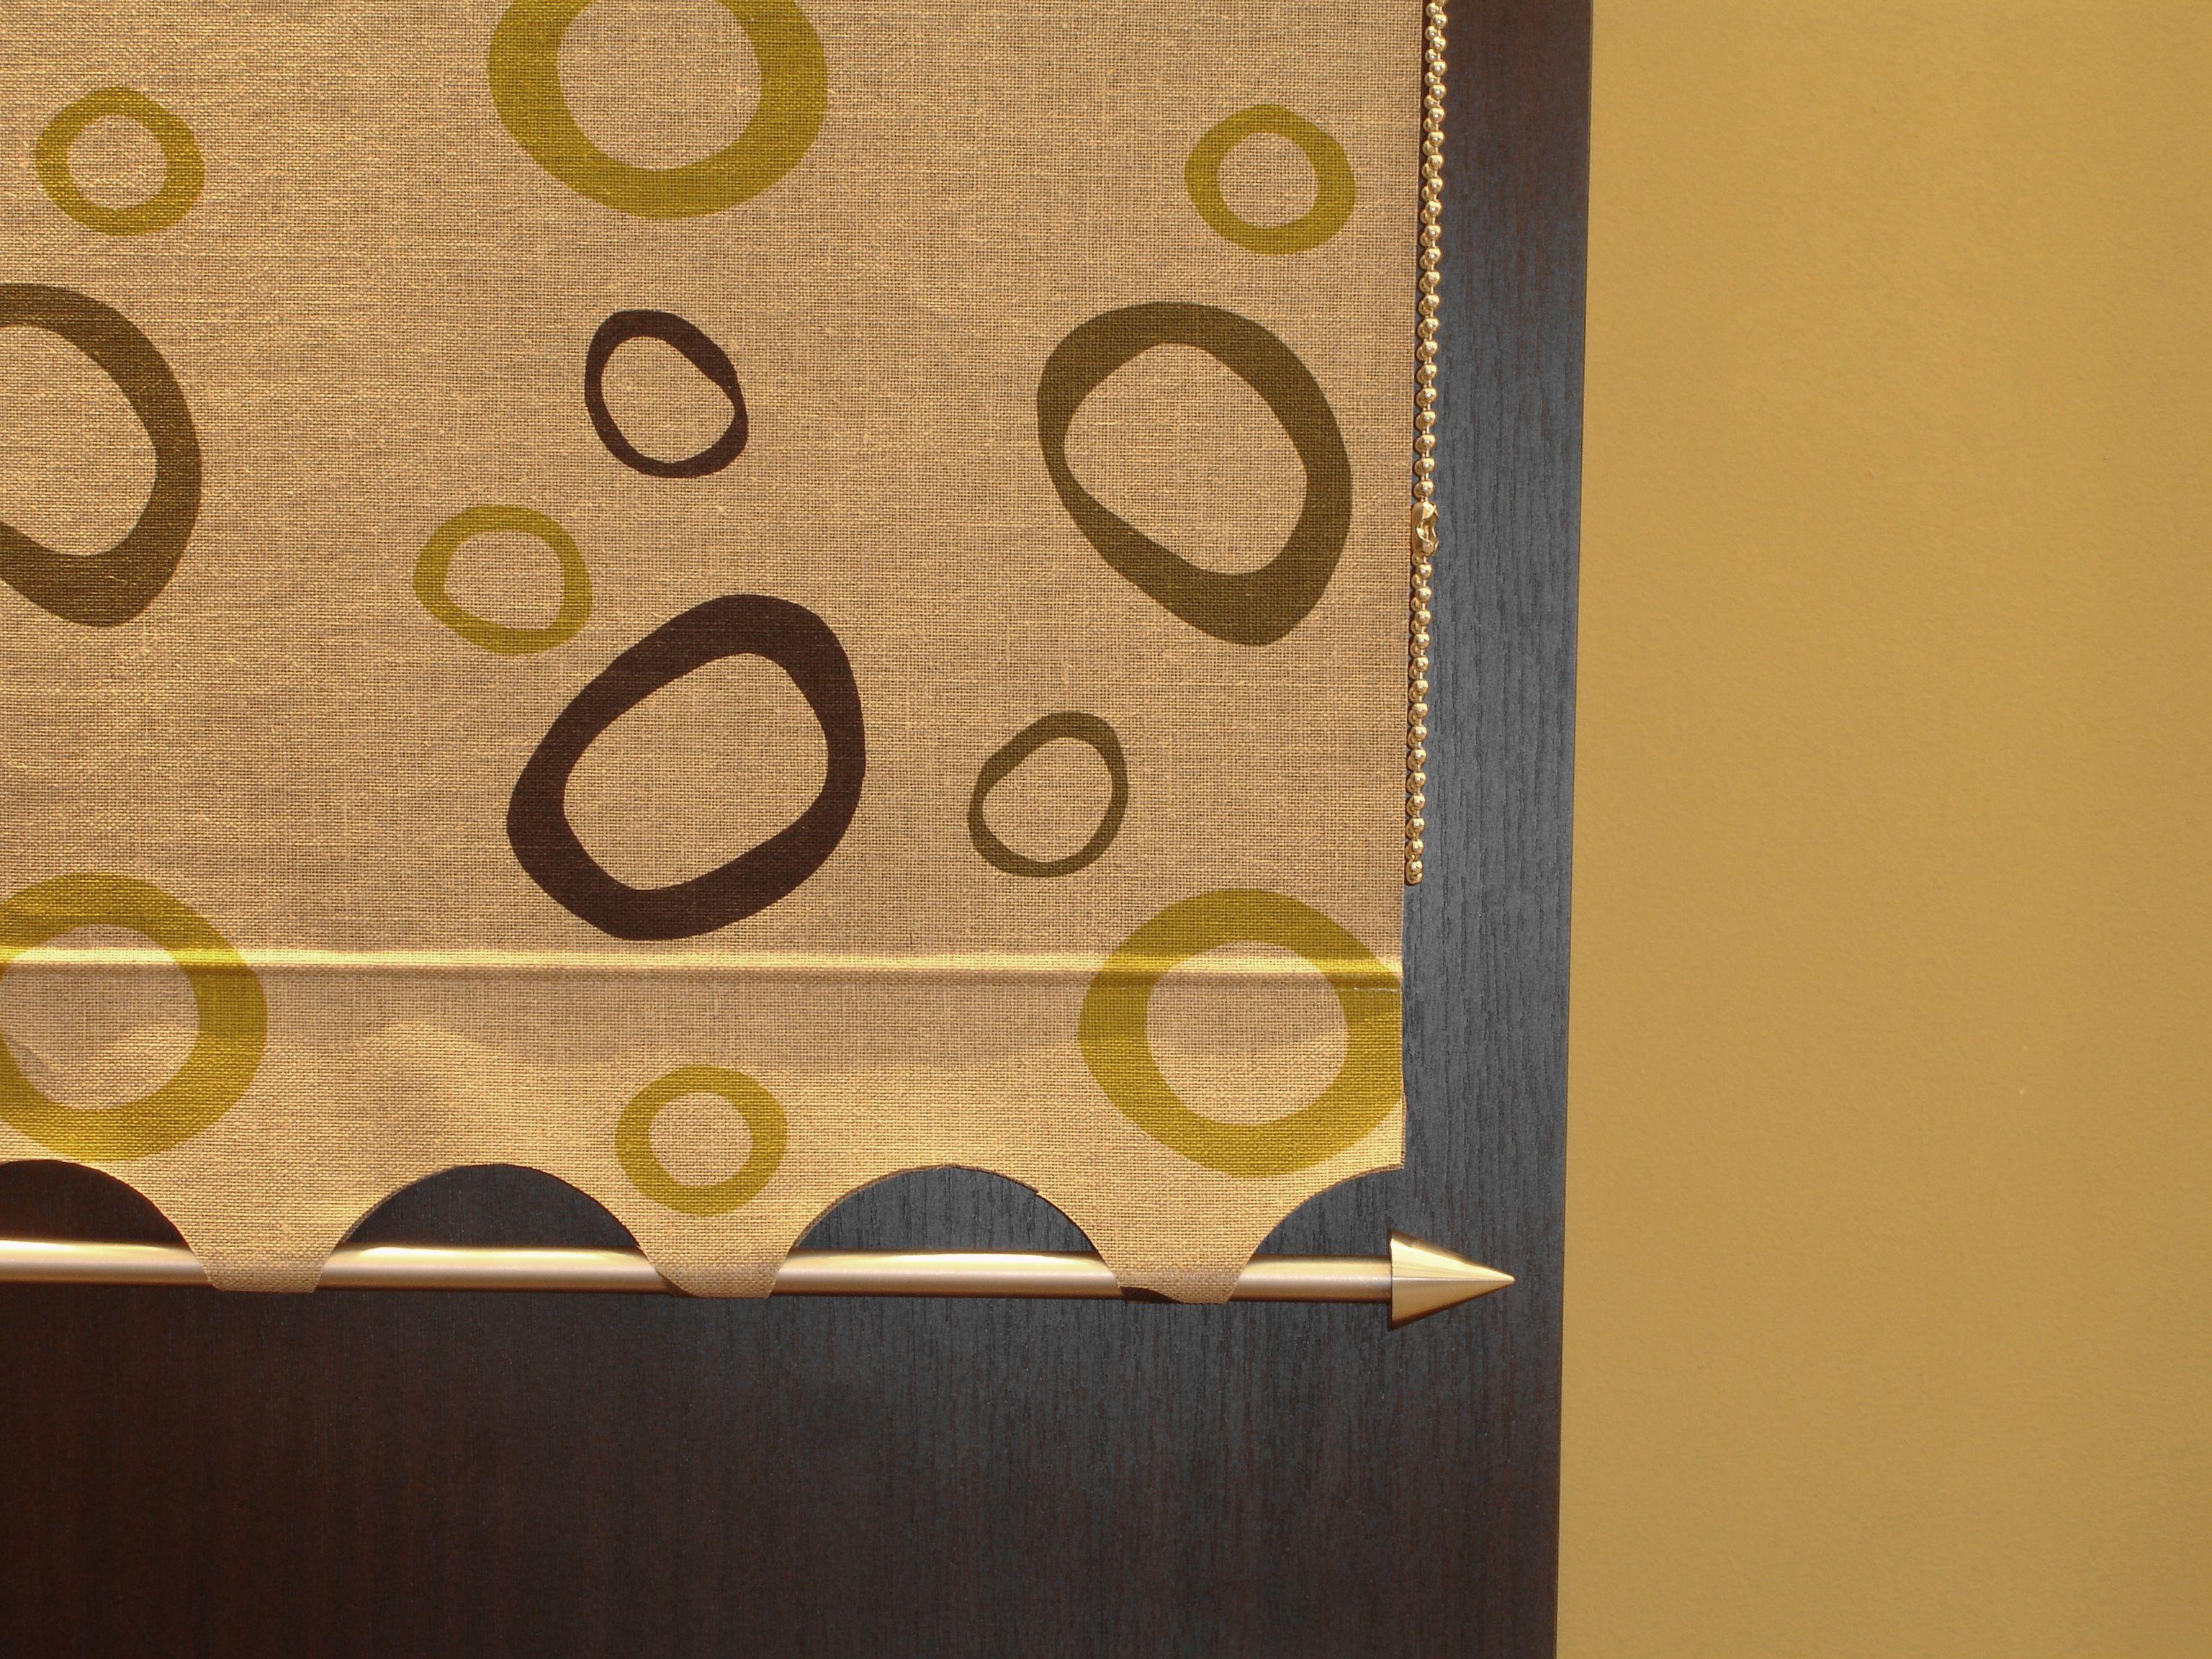 Rulouri textile EURO DAN - Poza 9